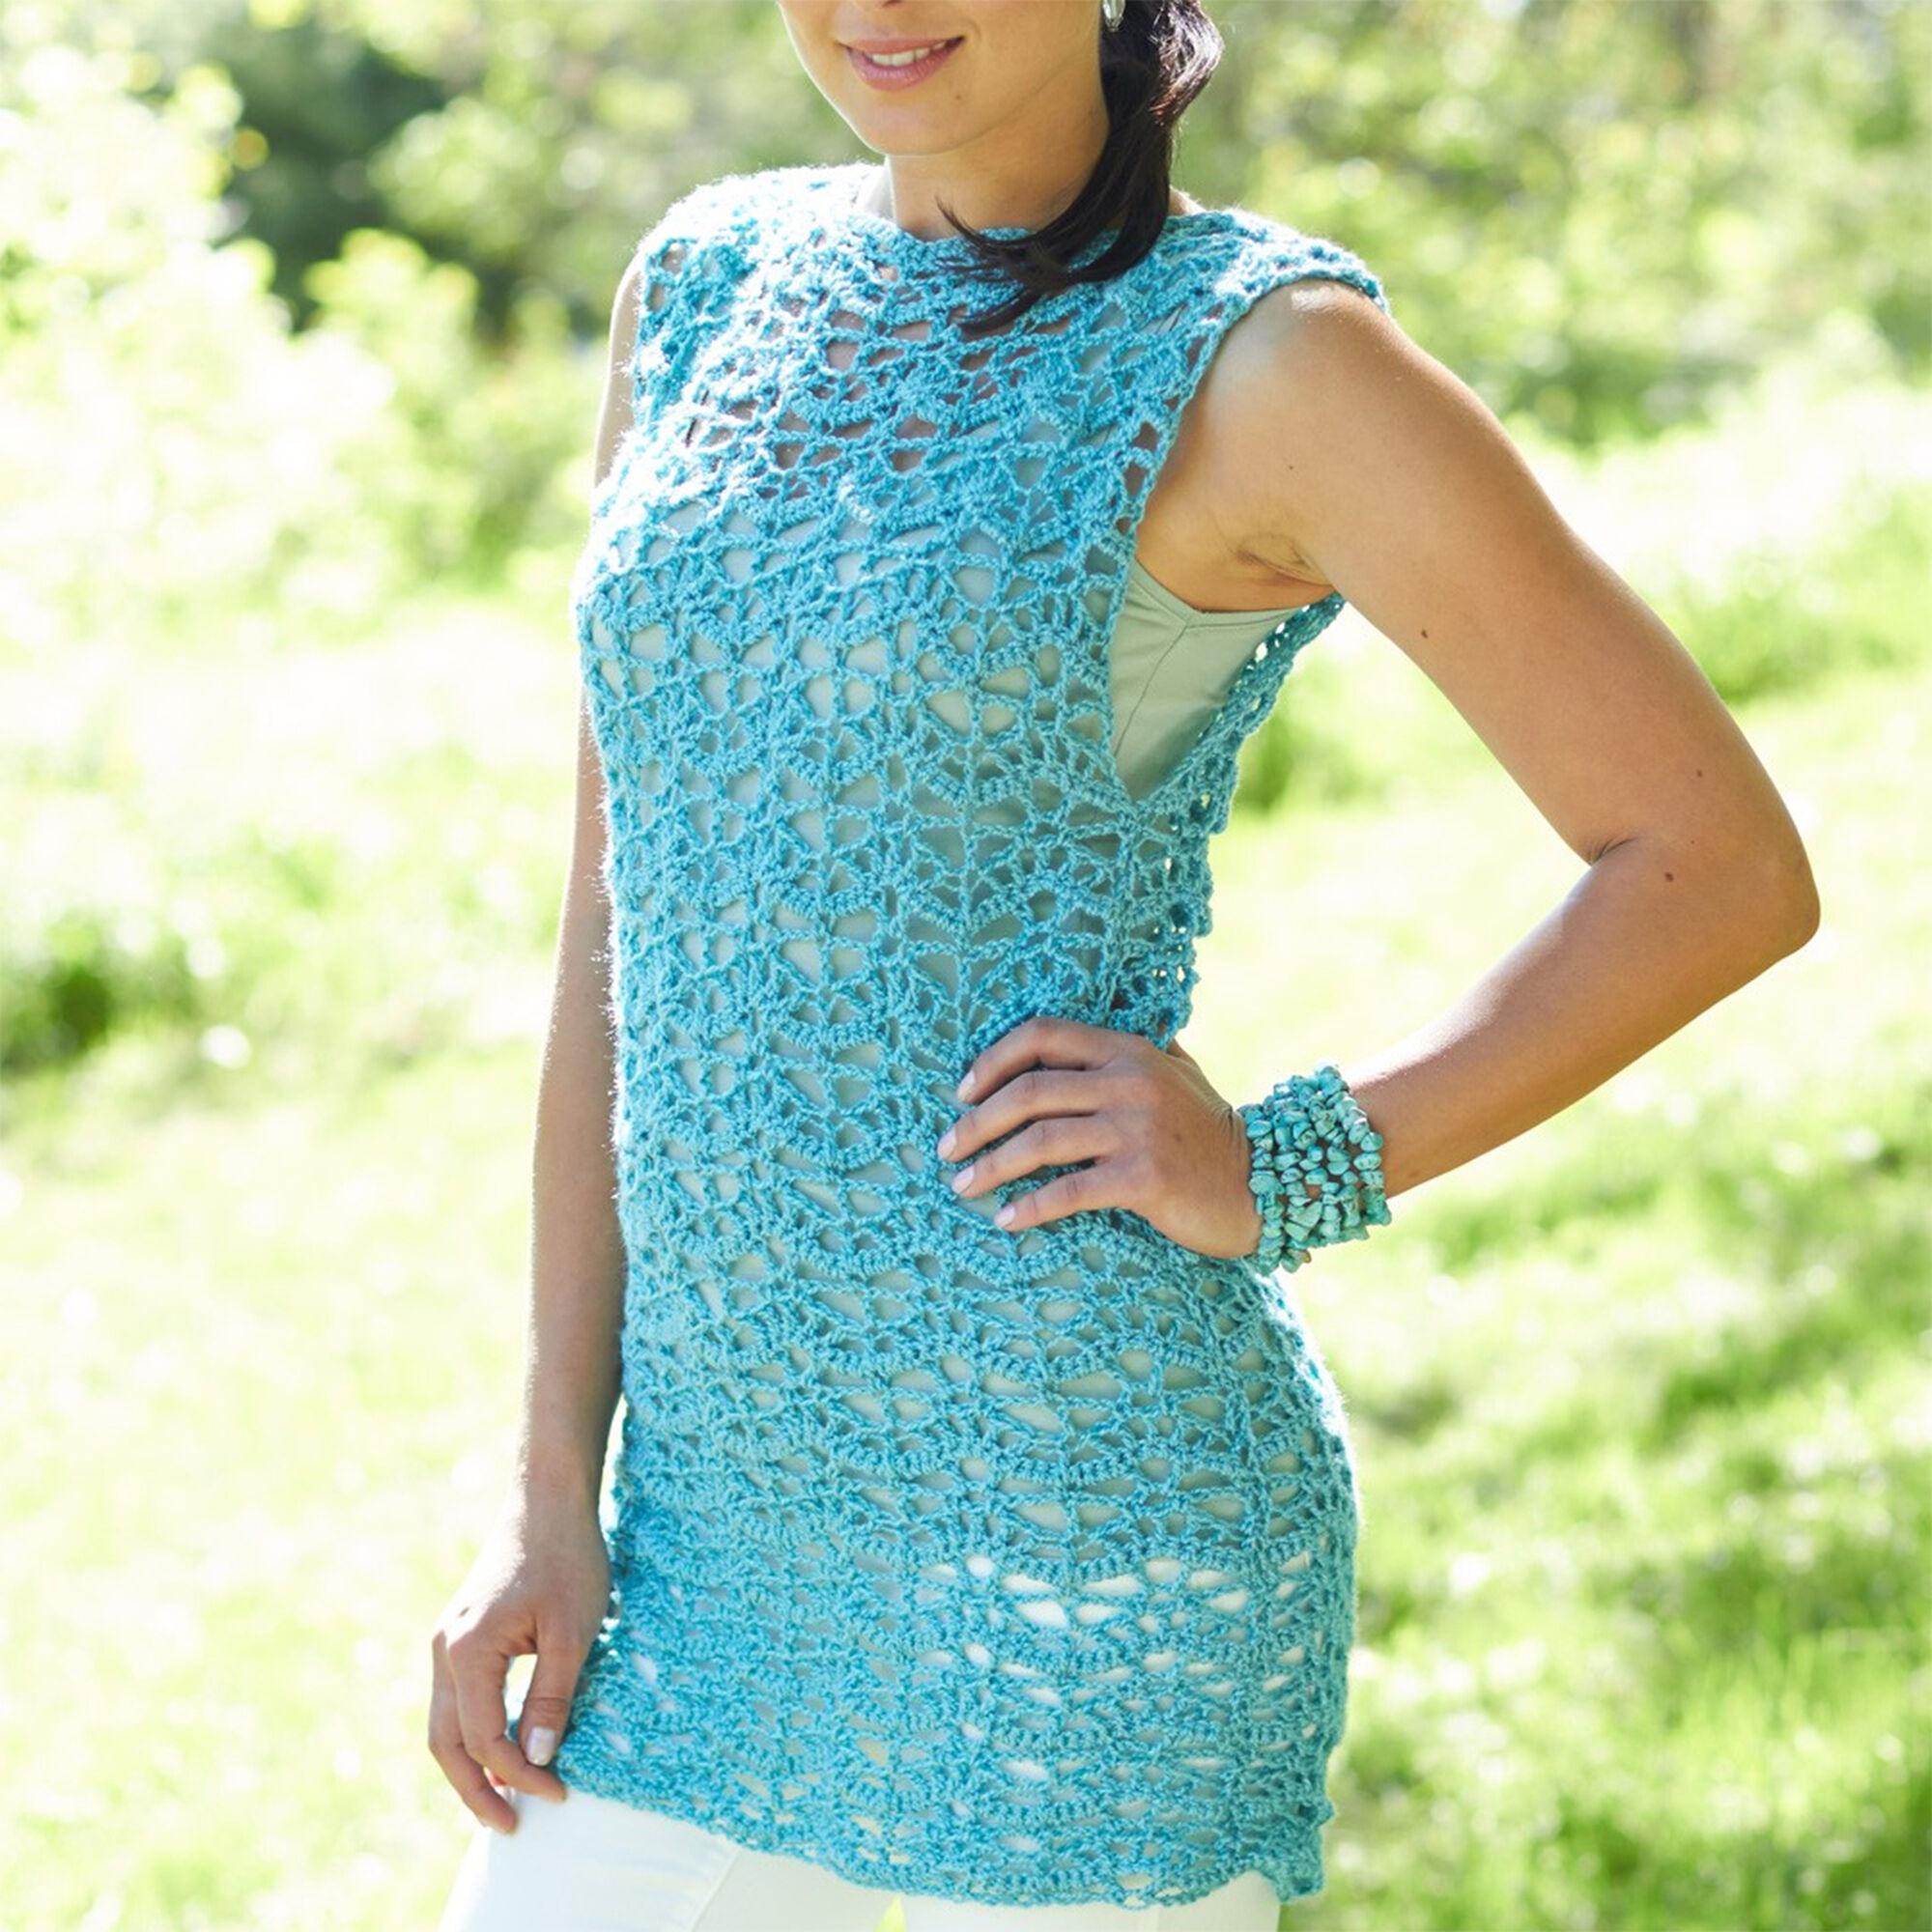 Caron Crochet Tunic, S Pattern | Yarnspirations